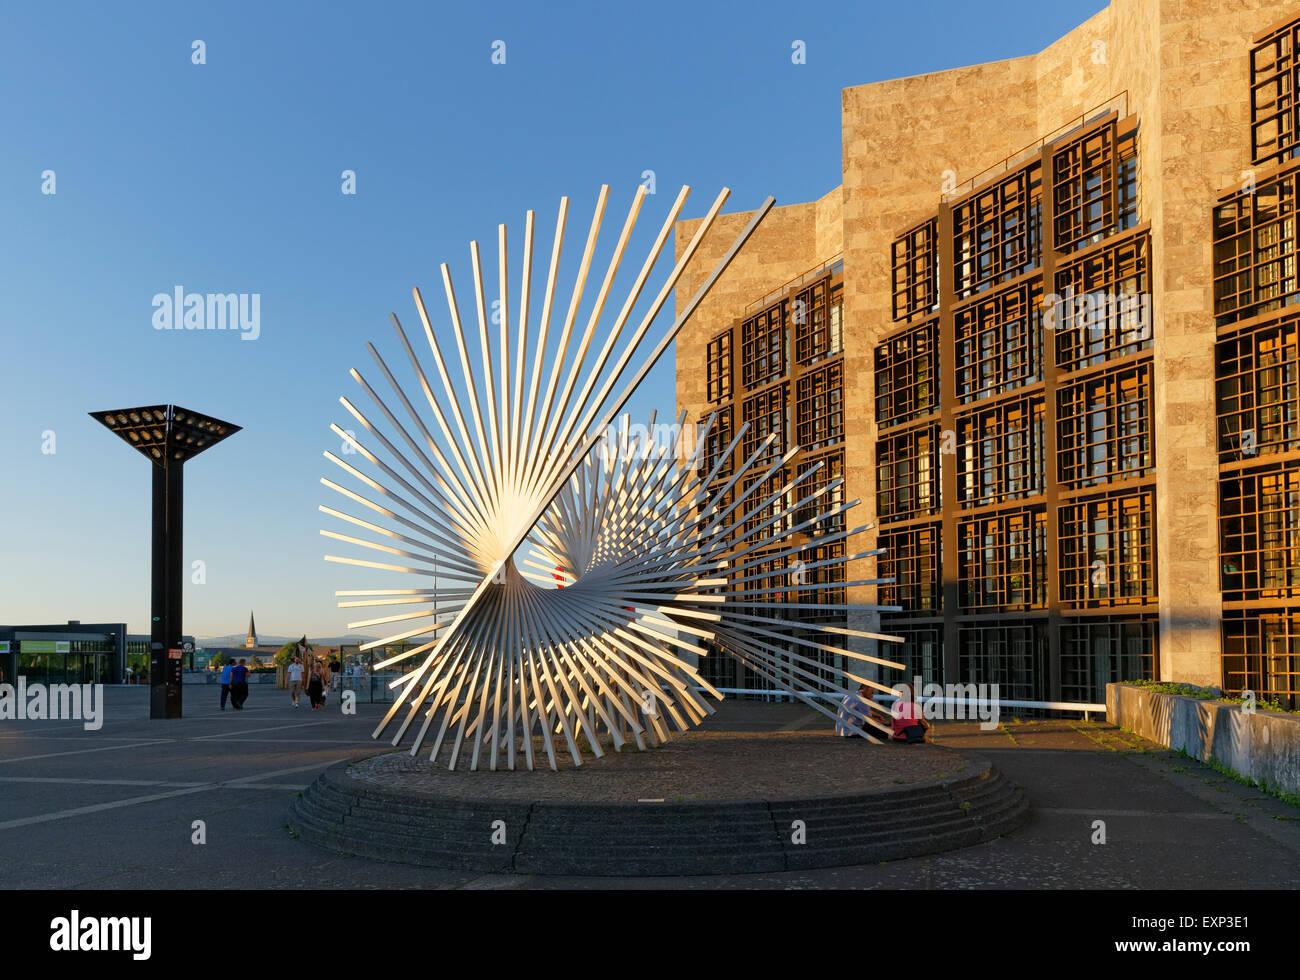 Sculpture Vitality by Andreu Alfaro and city hall, Jockel-Fuchs-Platz square, Mainz, Rhineland-Palatinate, Germany - Stock Image